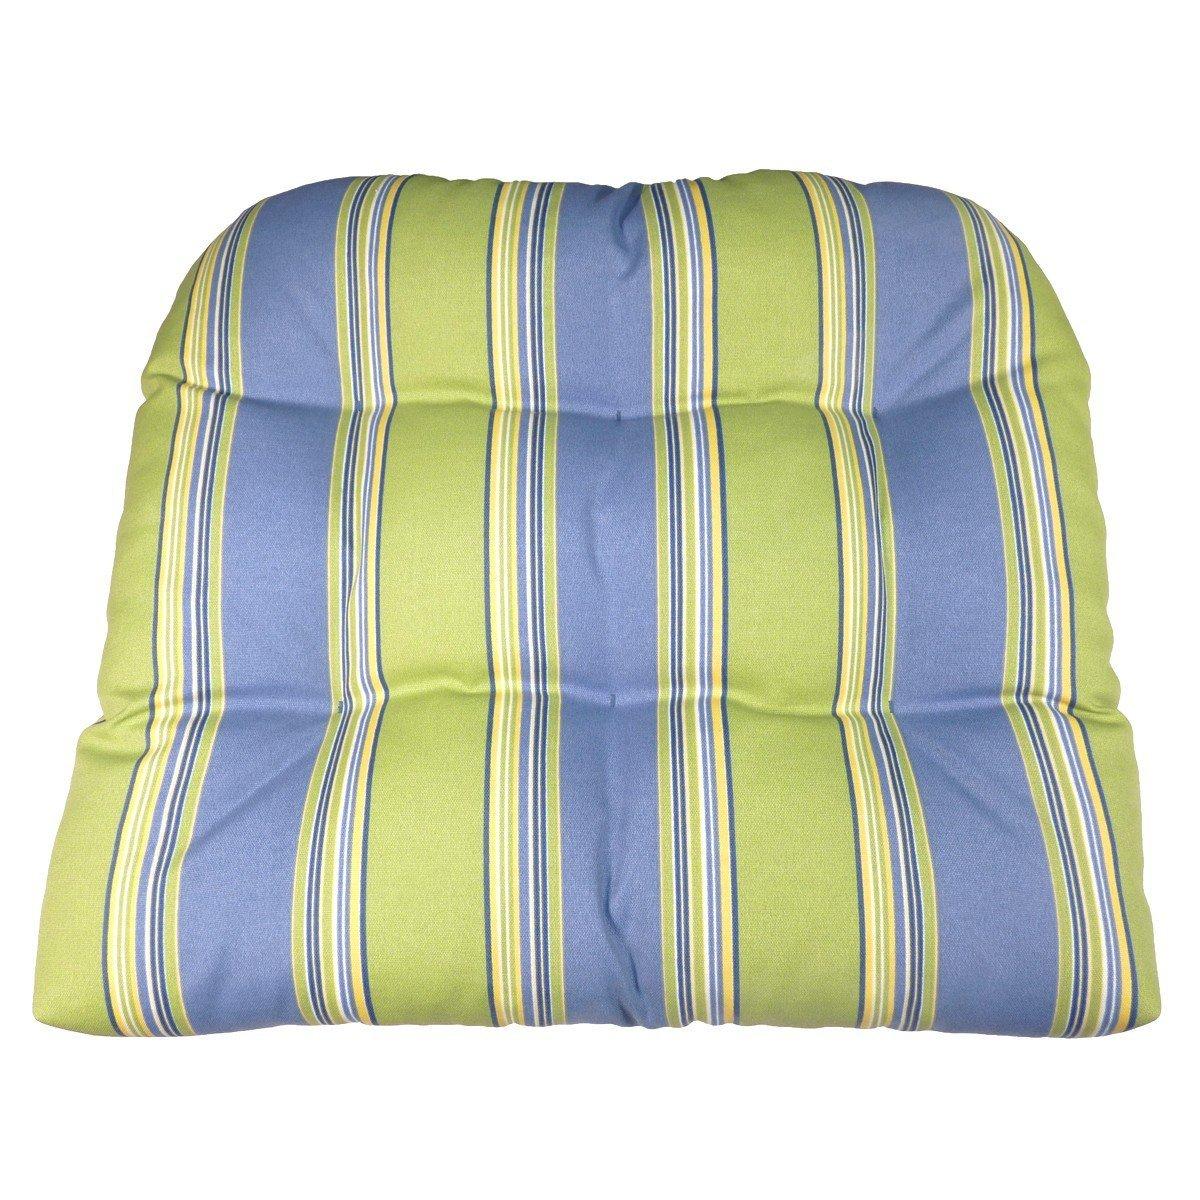 Buy Patio Chair Cushion Hampton Bay Blue Green Cabana